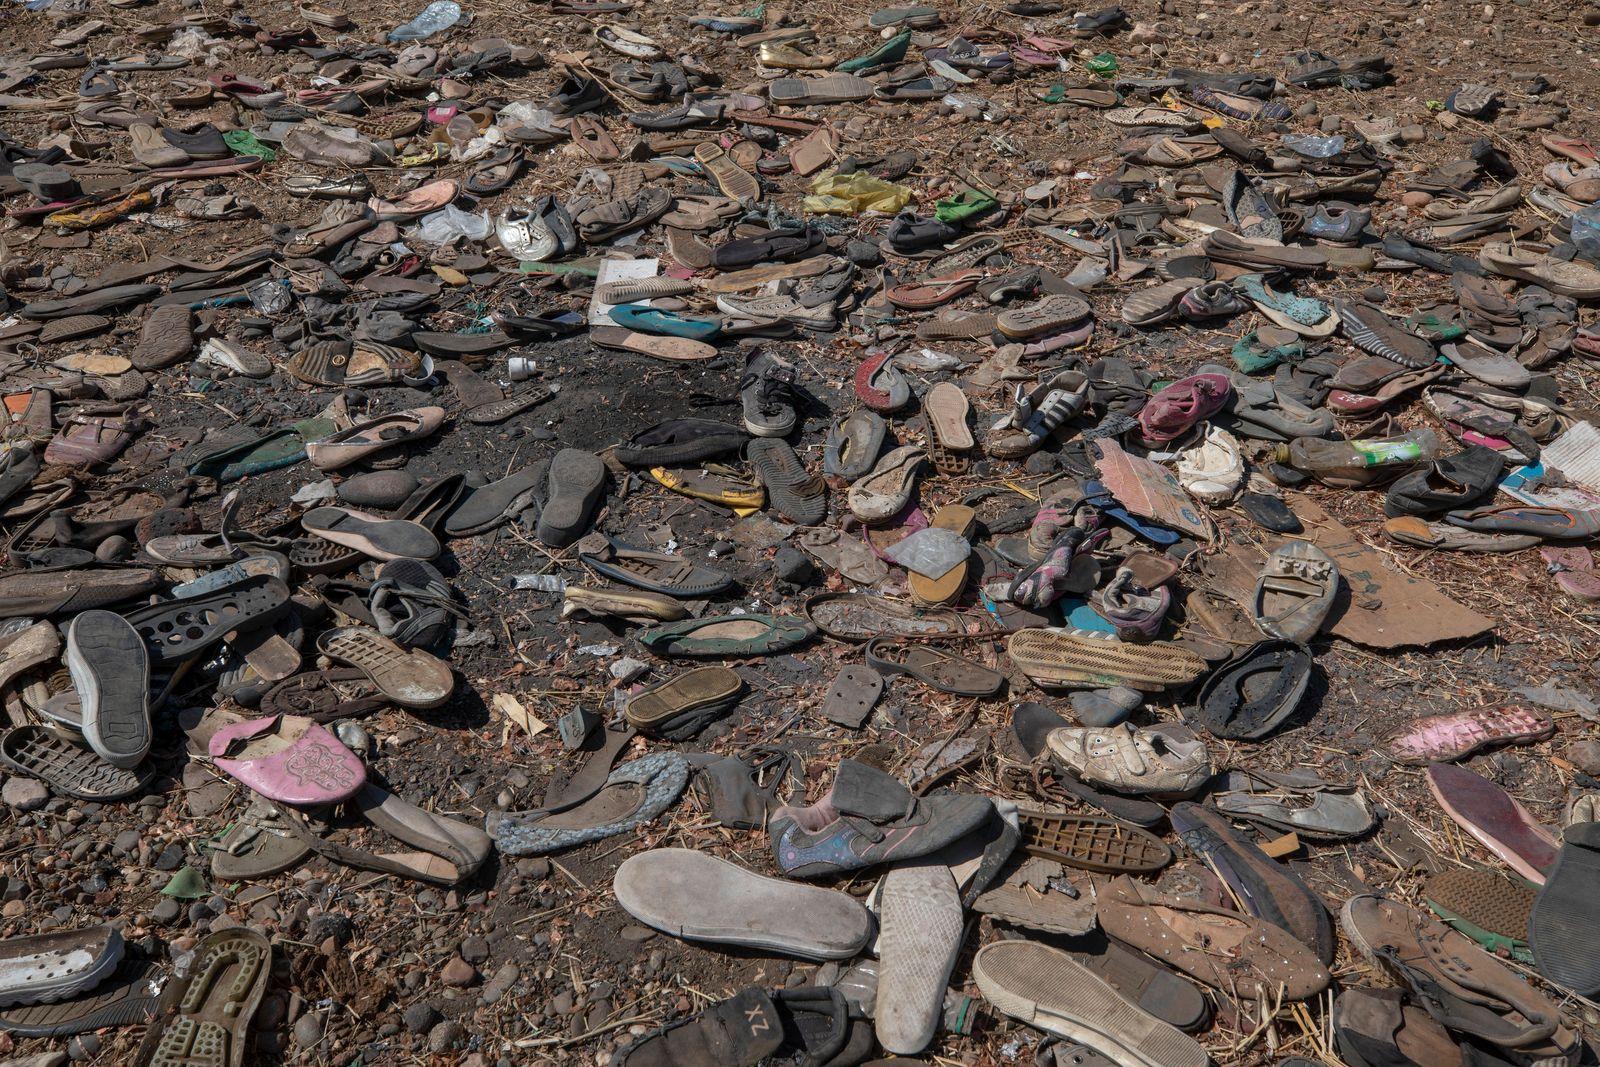 Erzbischof Tutus Stiftung prangert «Völkermord» in Tigray an